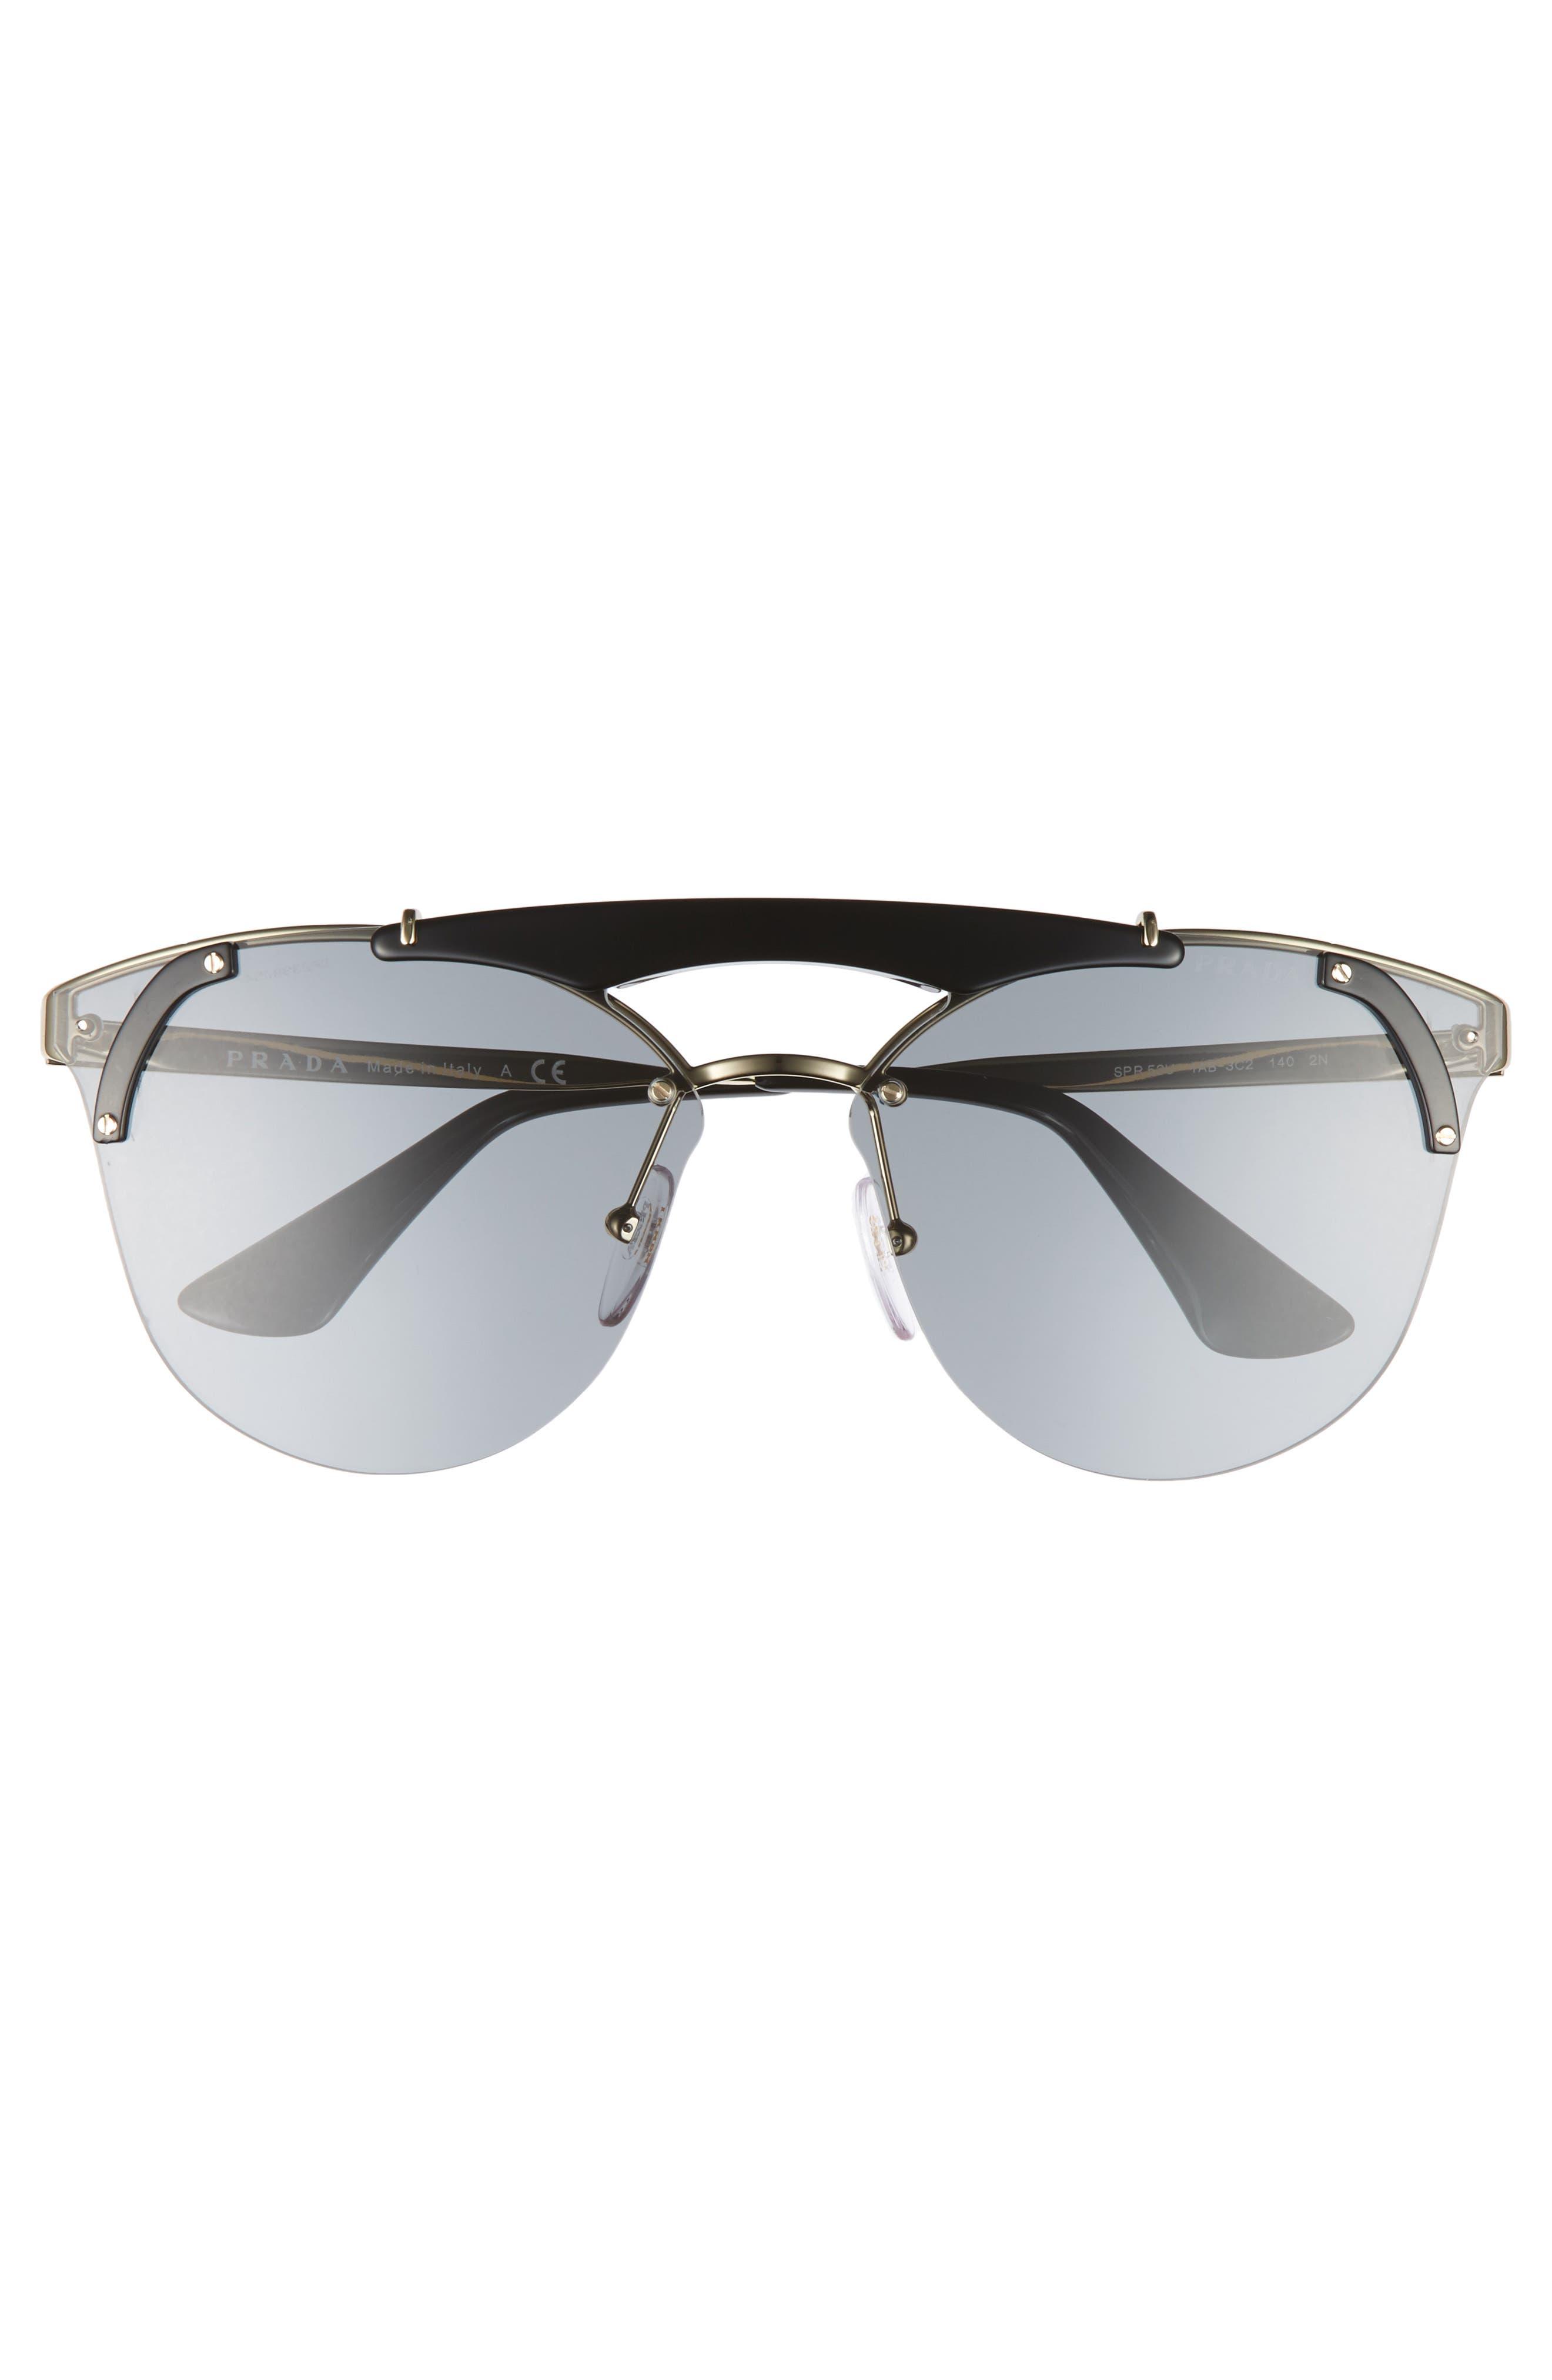 53mm Round Sunglasses,                             Alternate thumbnail 4, color,                             710